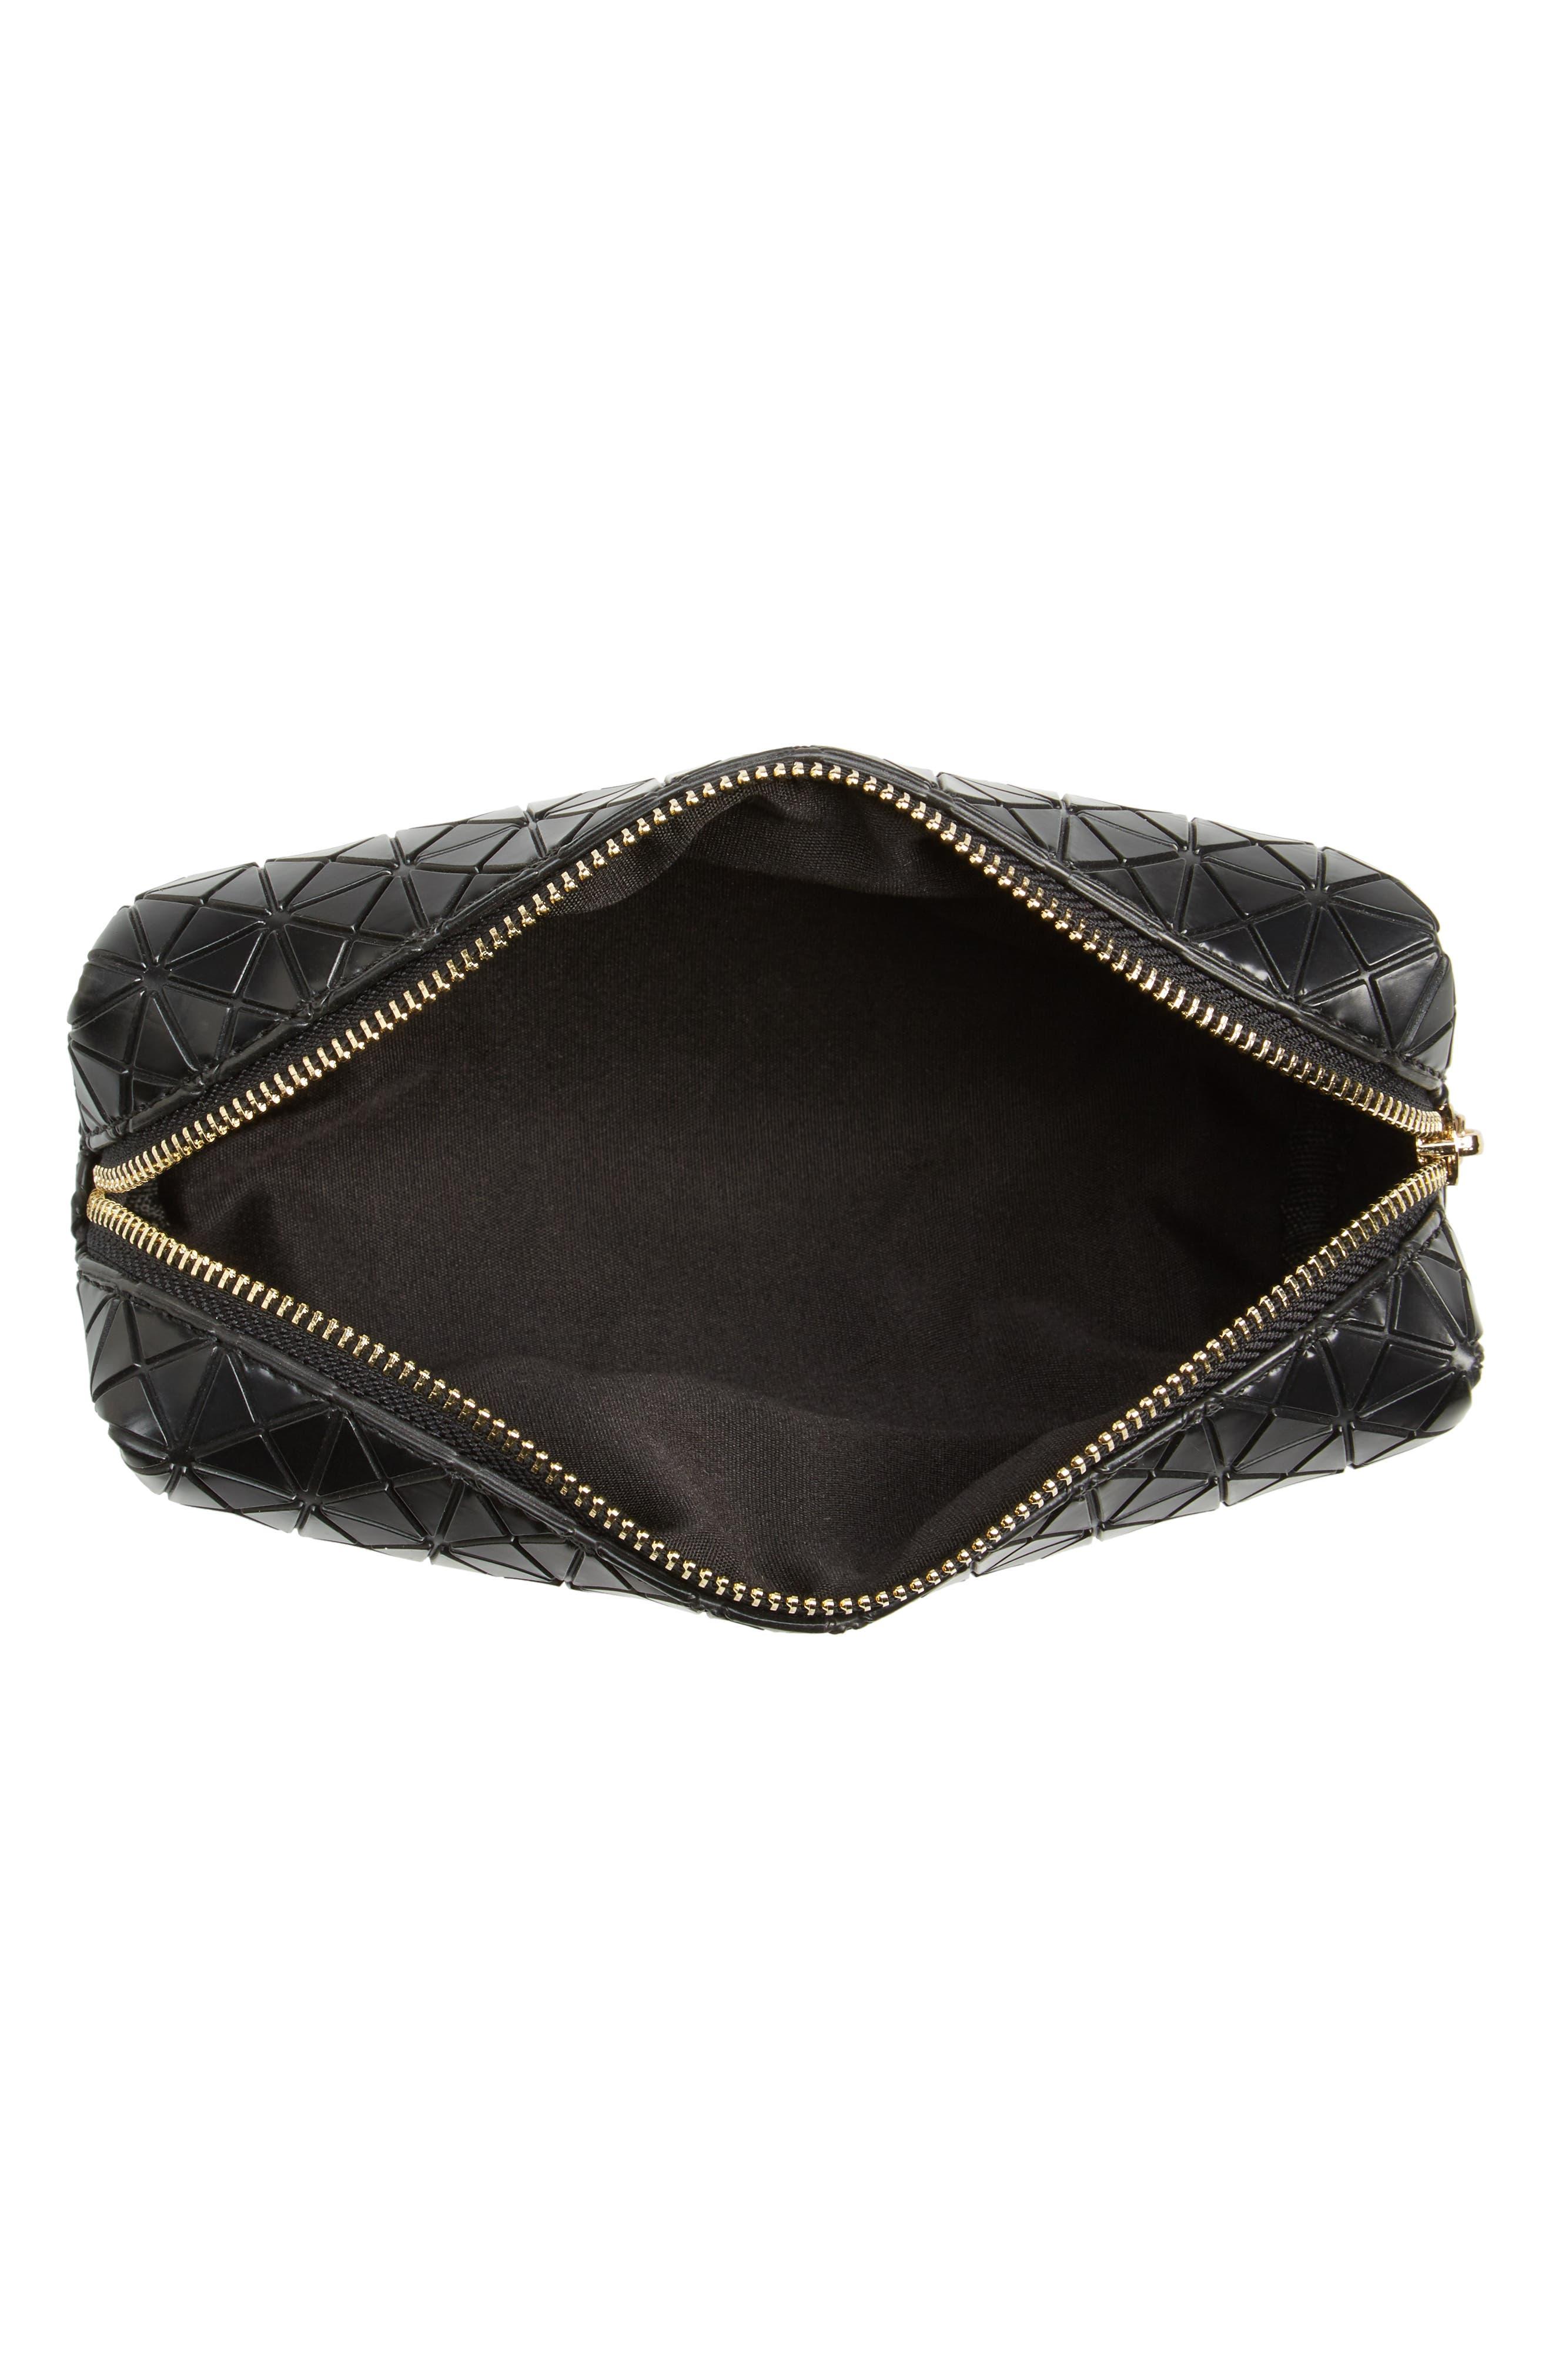 Diamond Embossed Cosmetics Bag,                             Alternate thumbnail 3, color,                             001